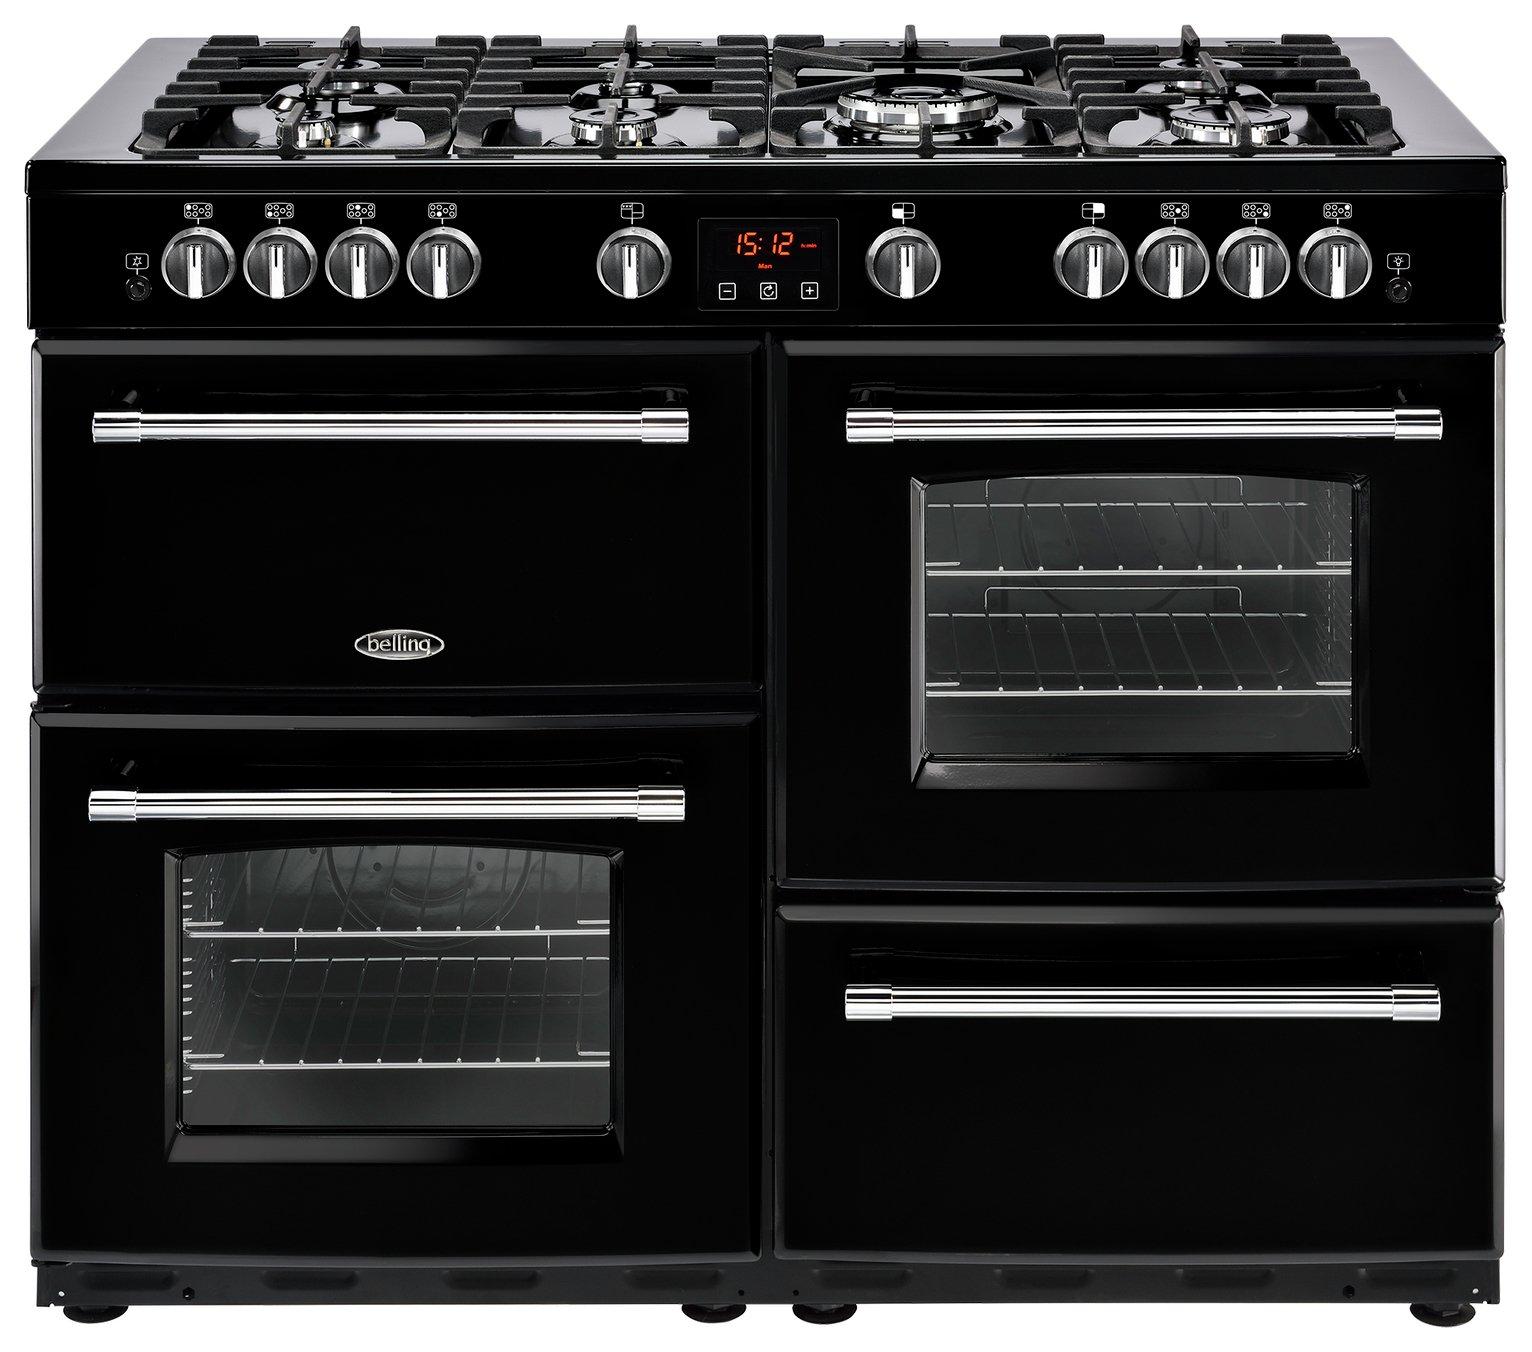 Belling Farmhouse 444444145 Dual Fuel Range Cooker - Black